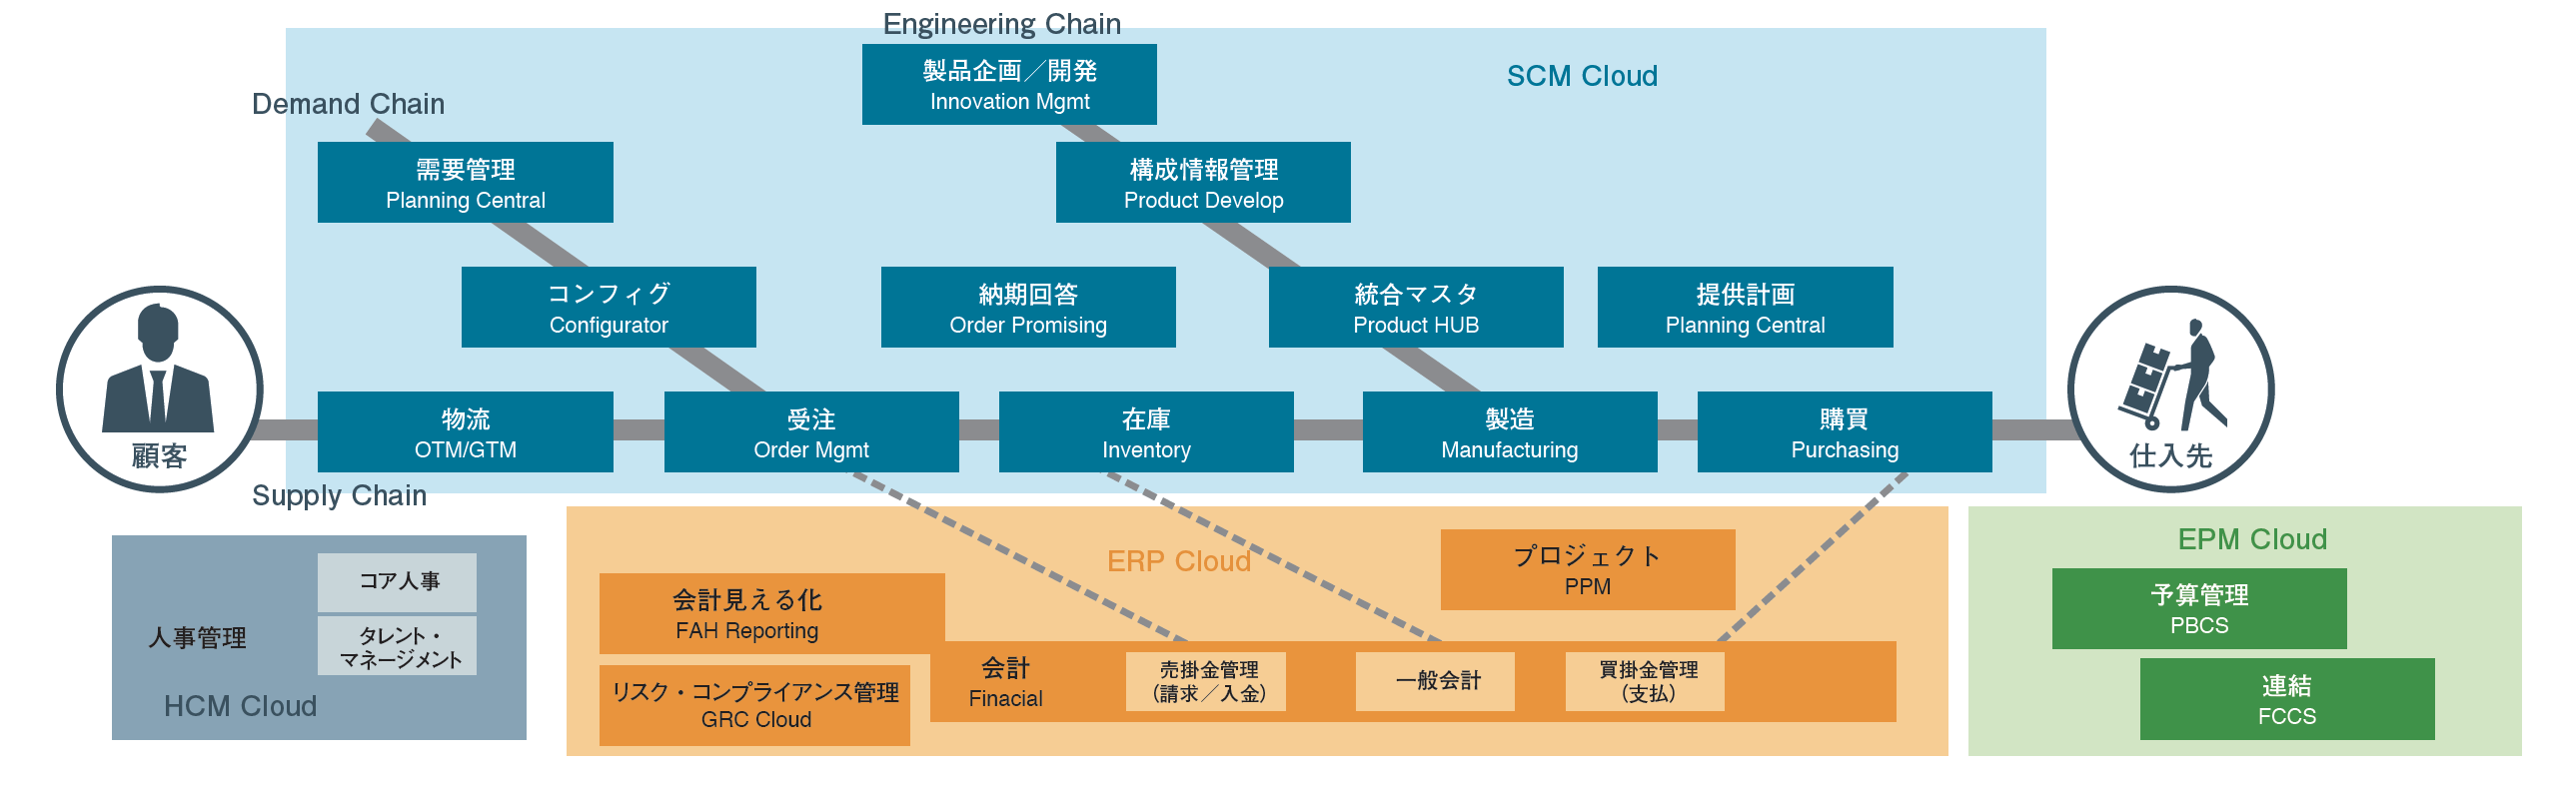 Oracle ERP Cloud モジュール